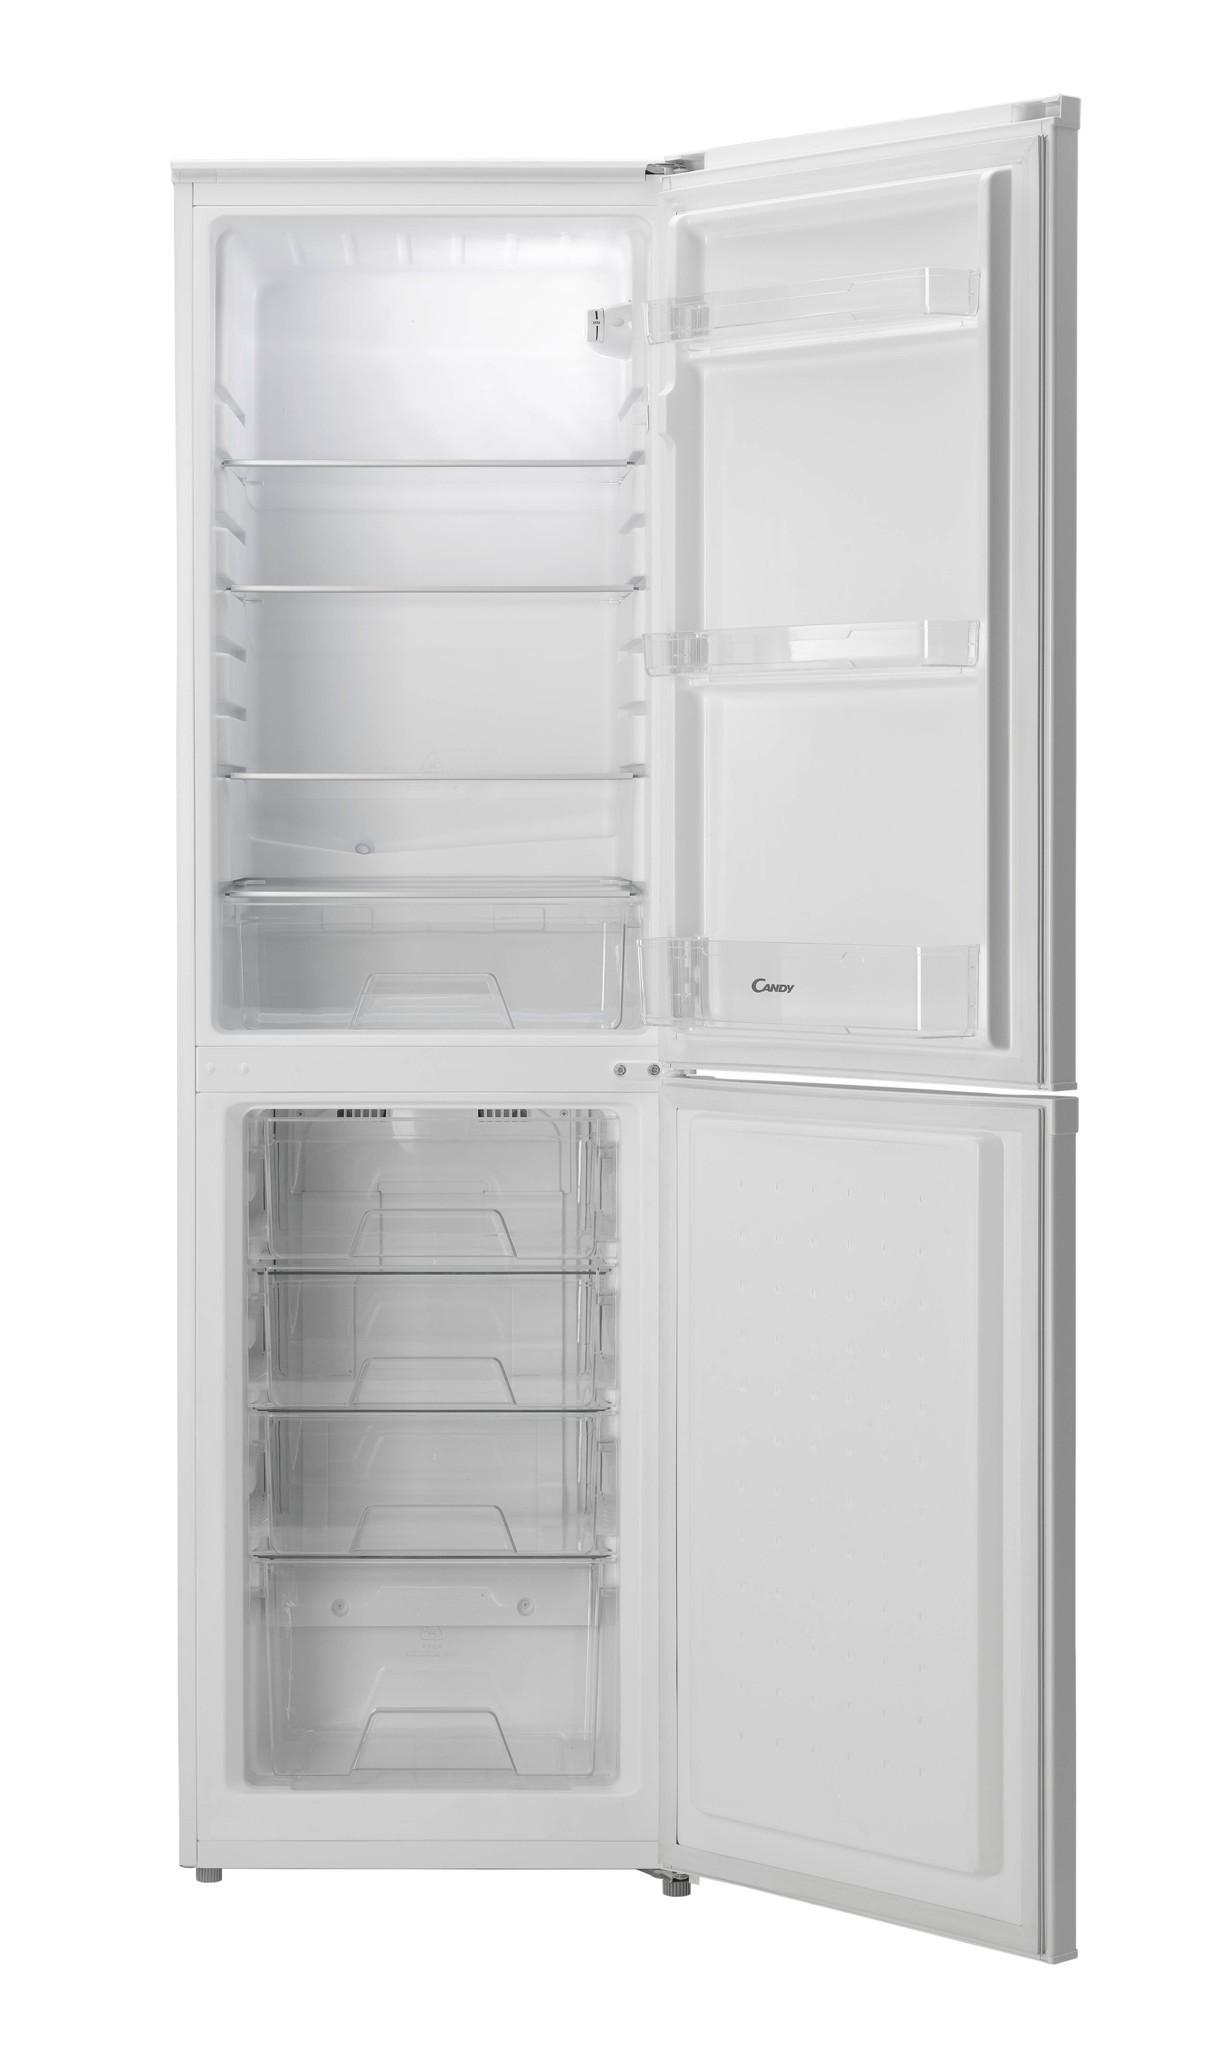 Candy CCBF5182WK Fridge Freezer